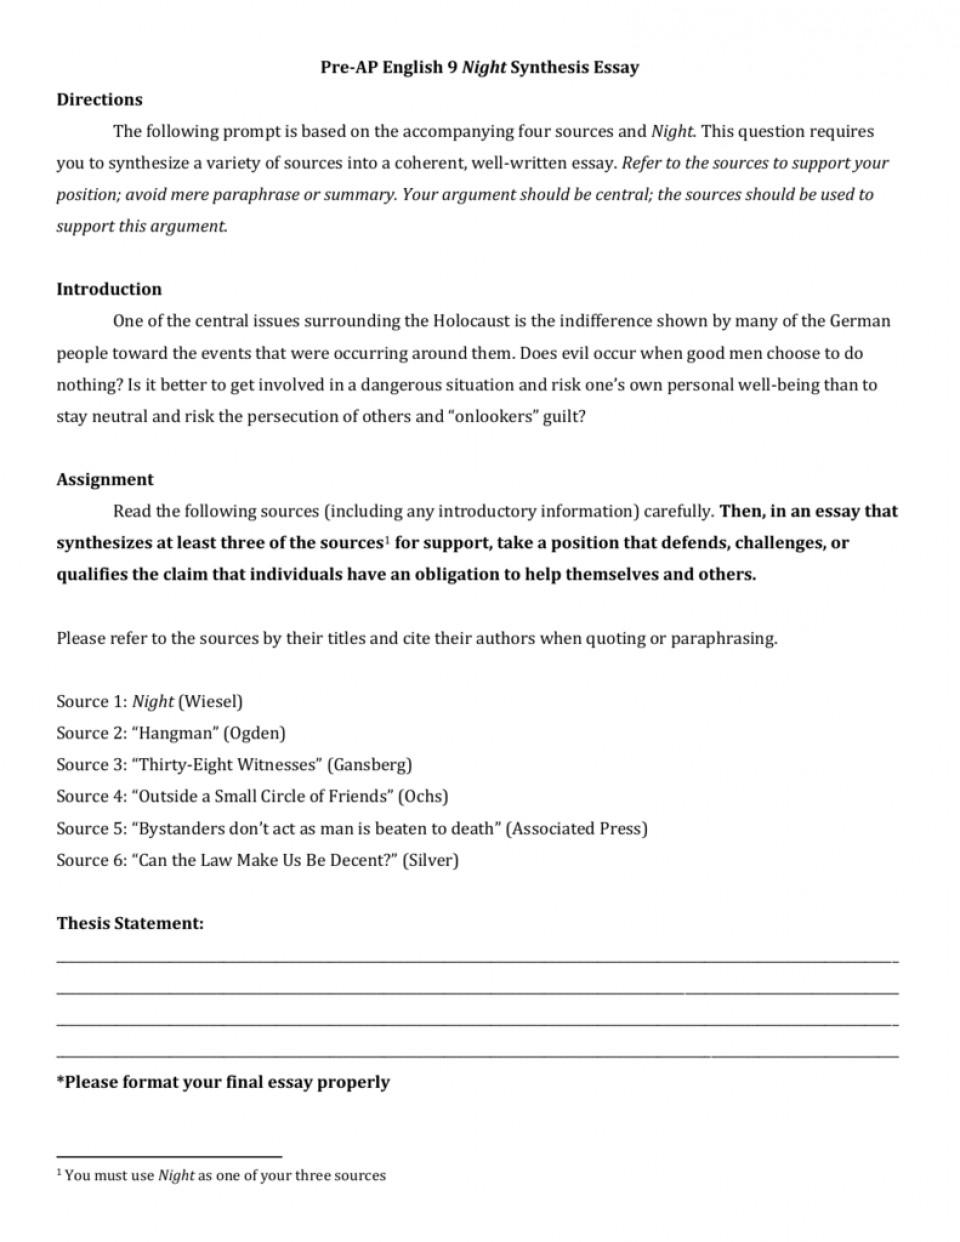 003 006963363 1 Synthesis Essay Sensational Outline Format Ap Lang 960